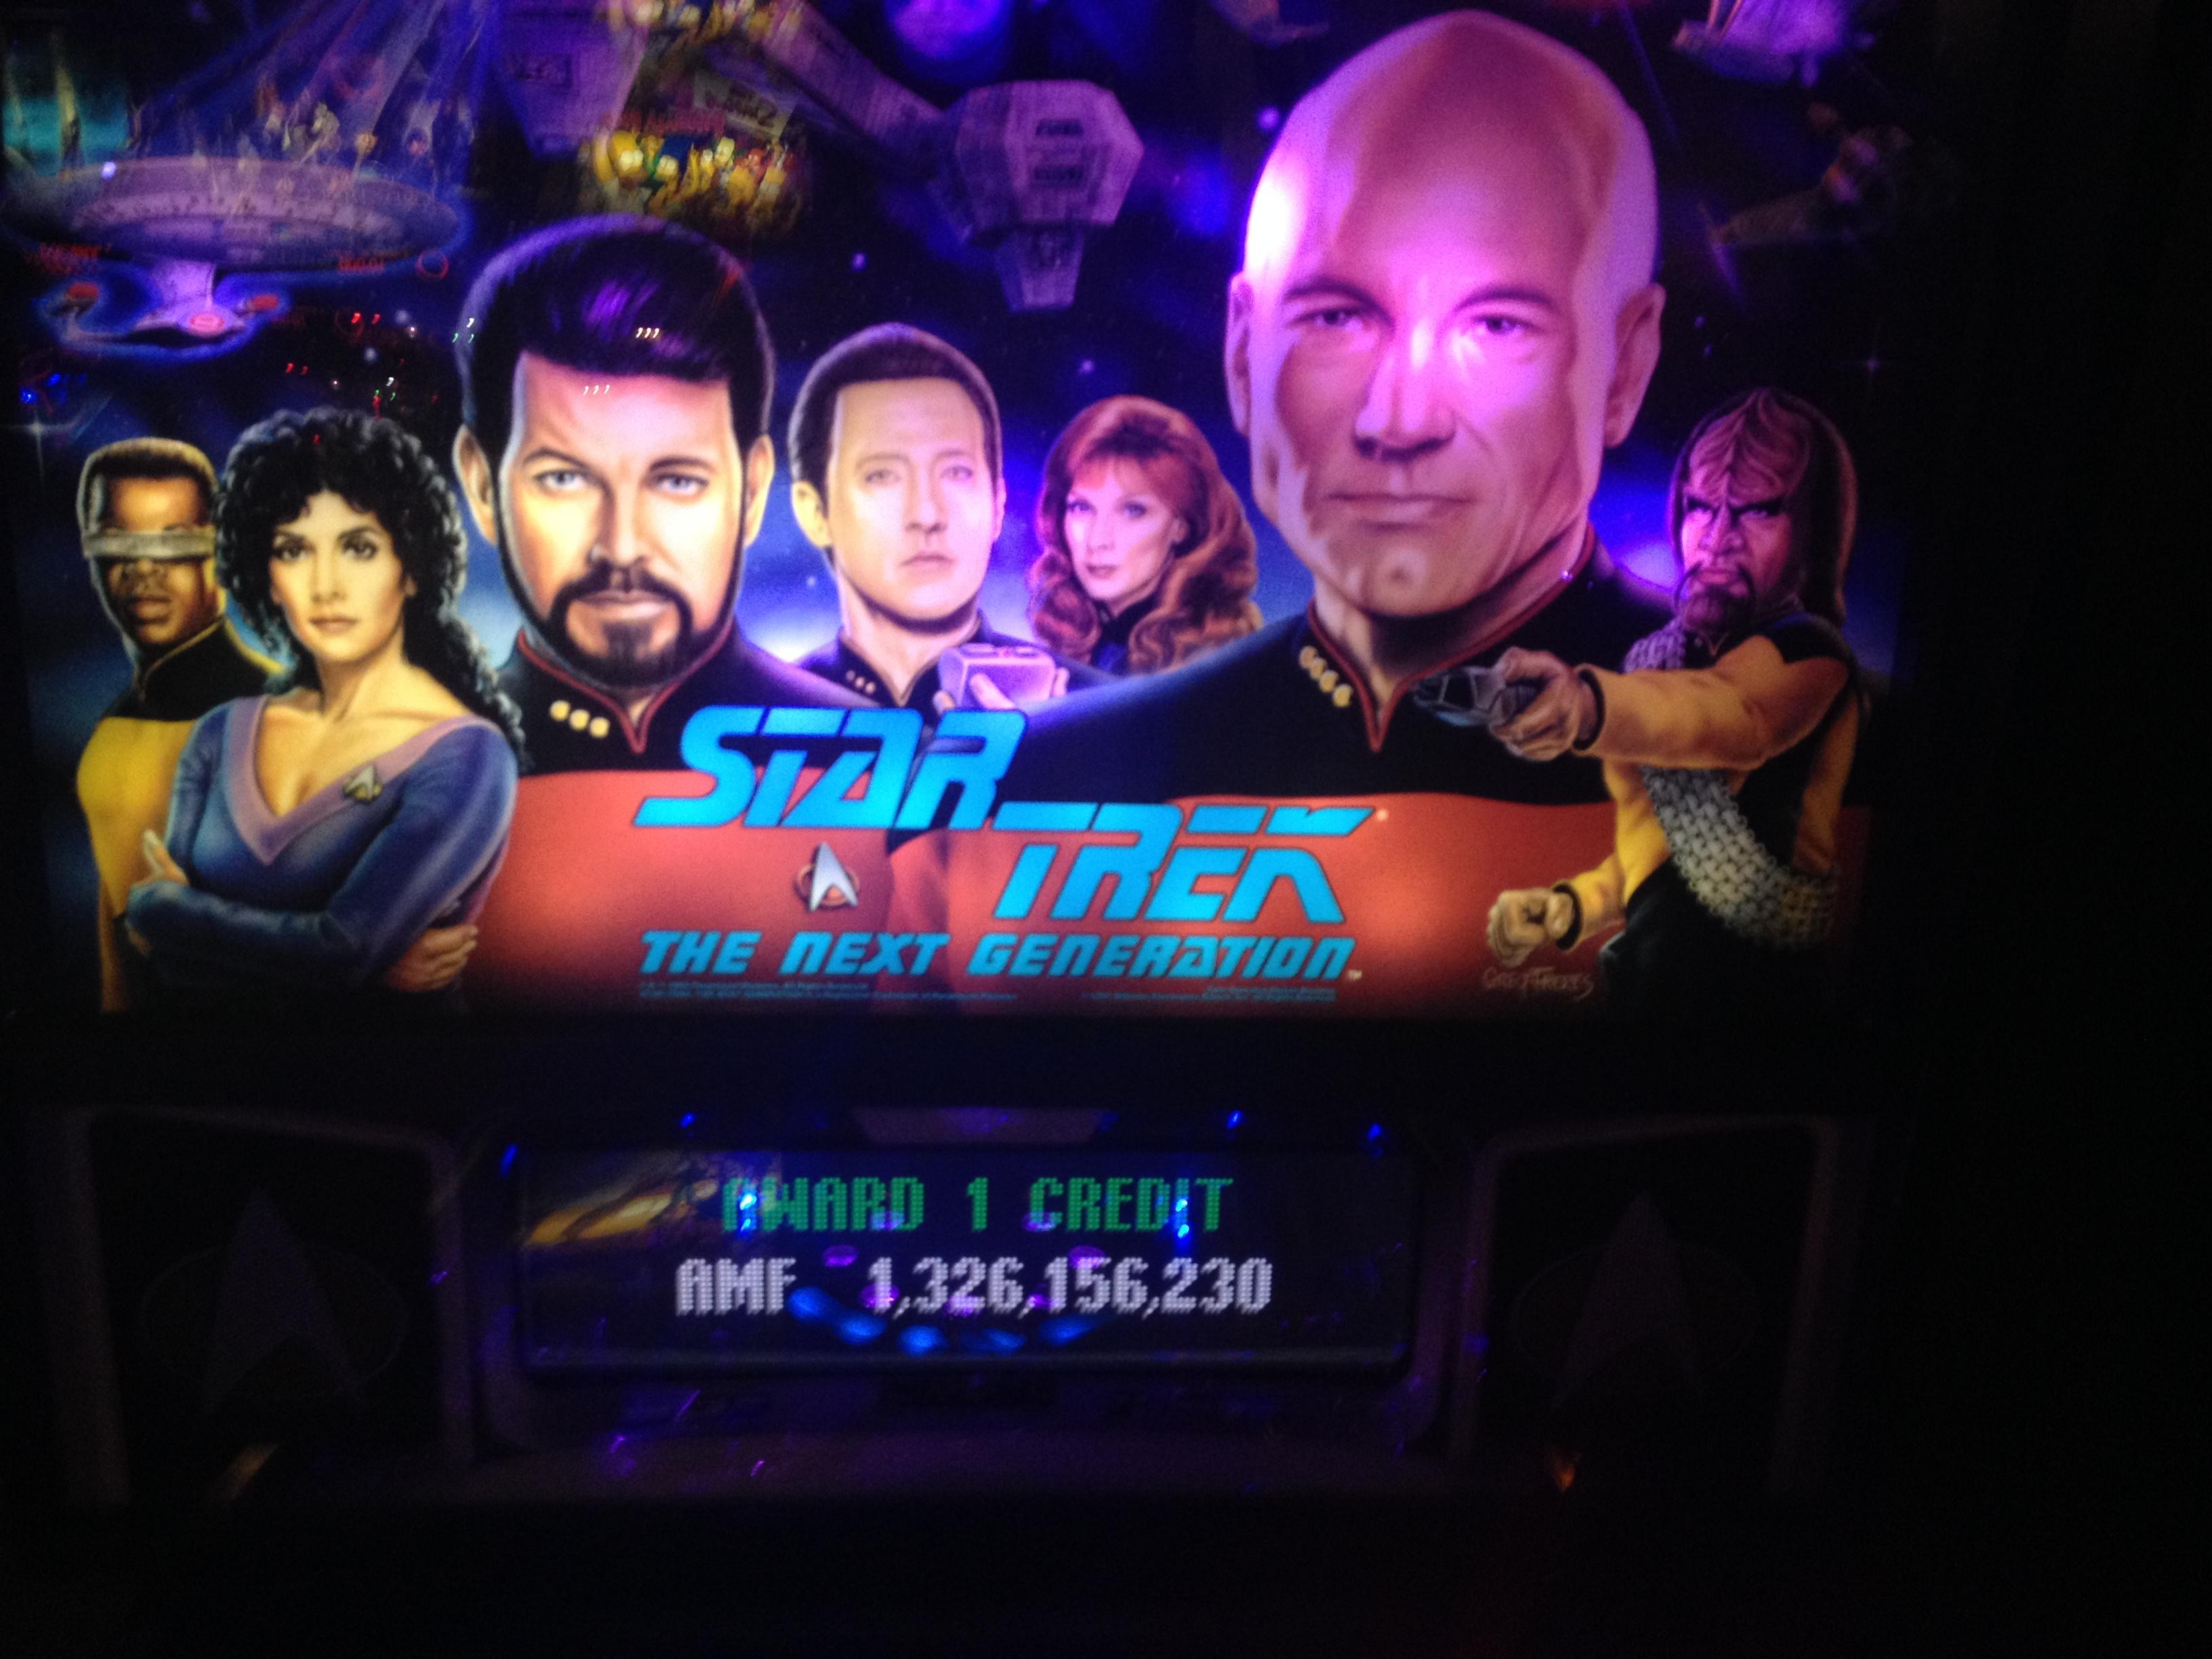 FosterAMF: Star Trek: The Next Generation (Pinball: 3 Balls) 1,326,156,230 points on 2014-11-05 20:09:59